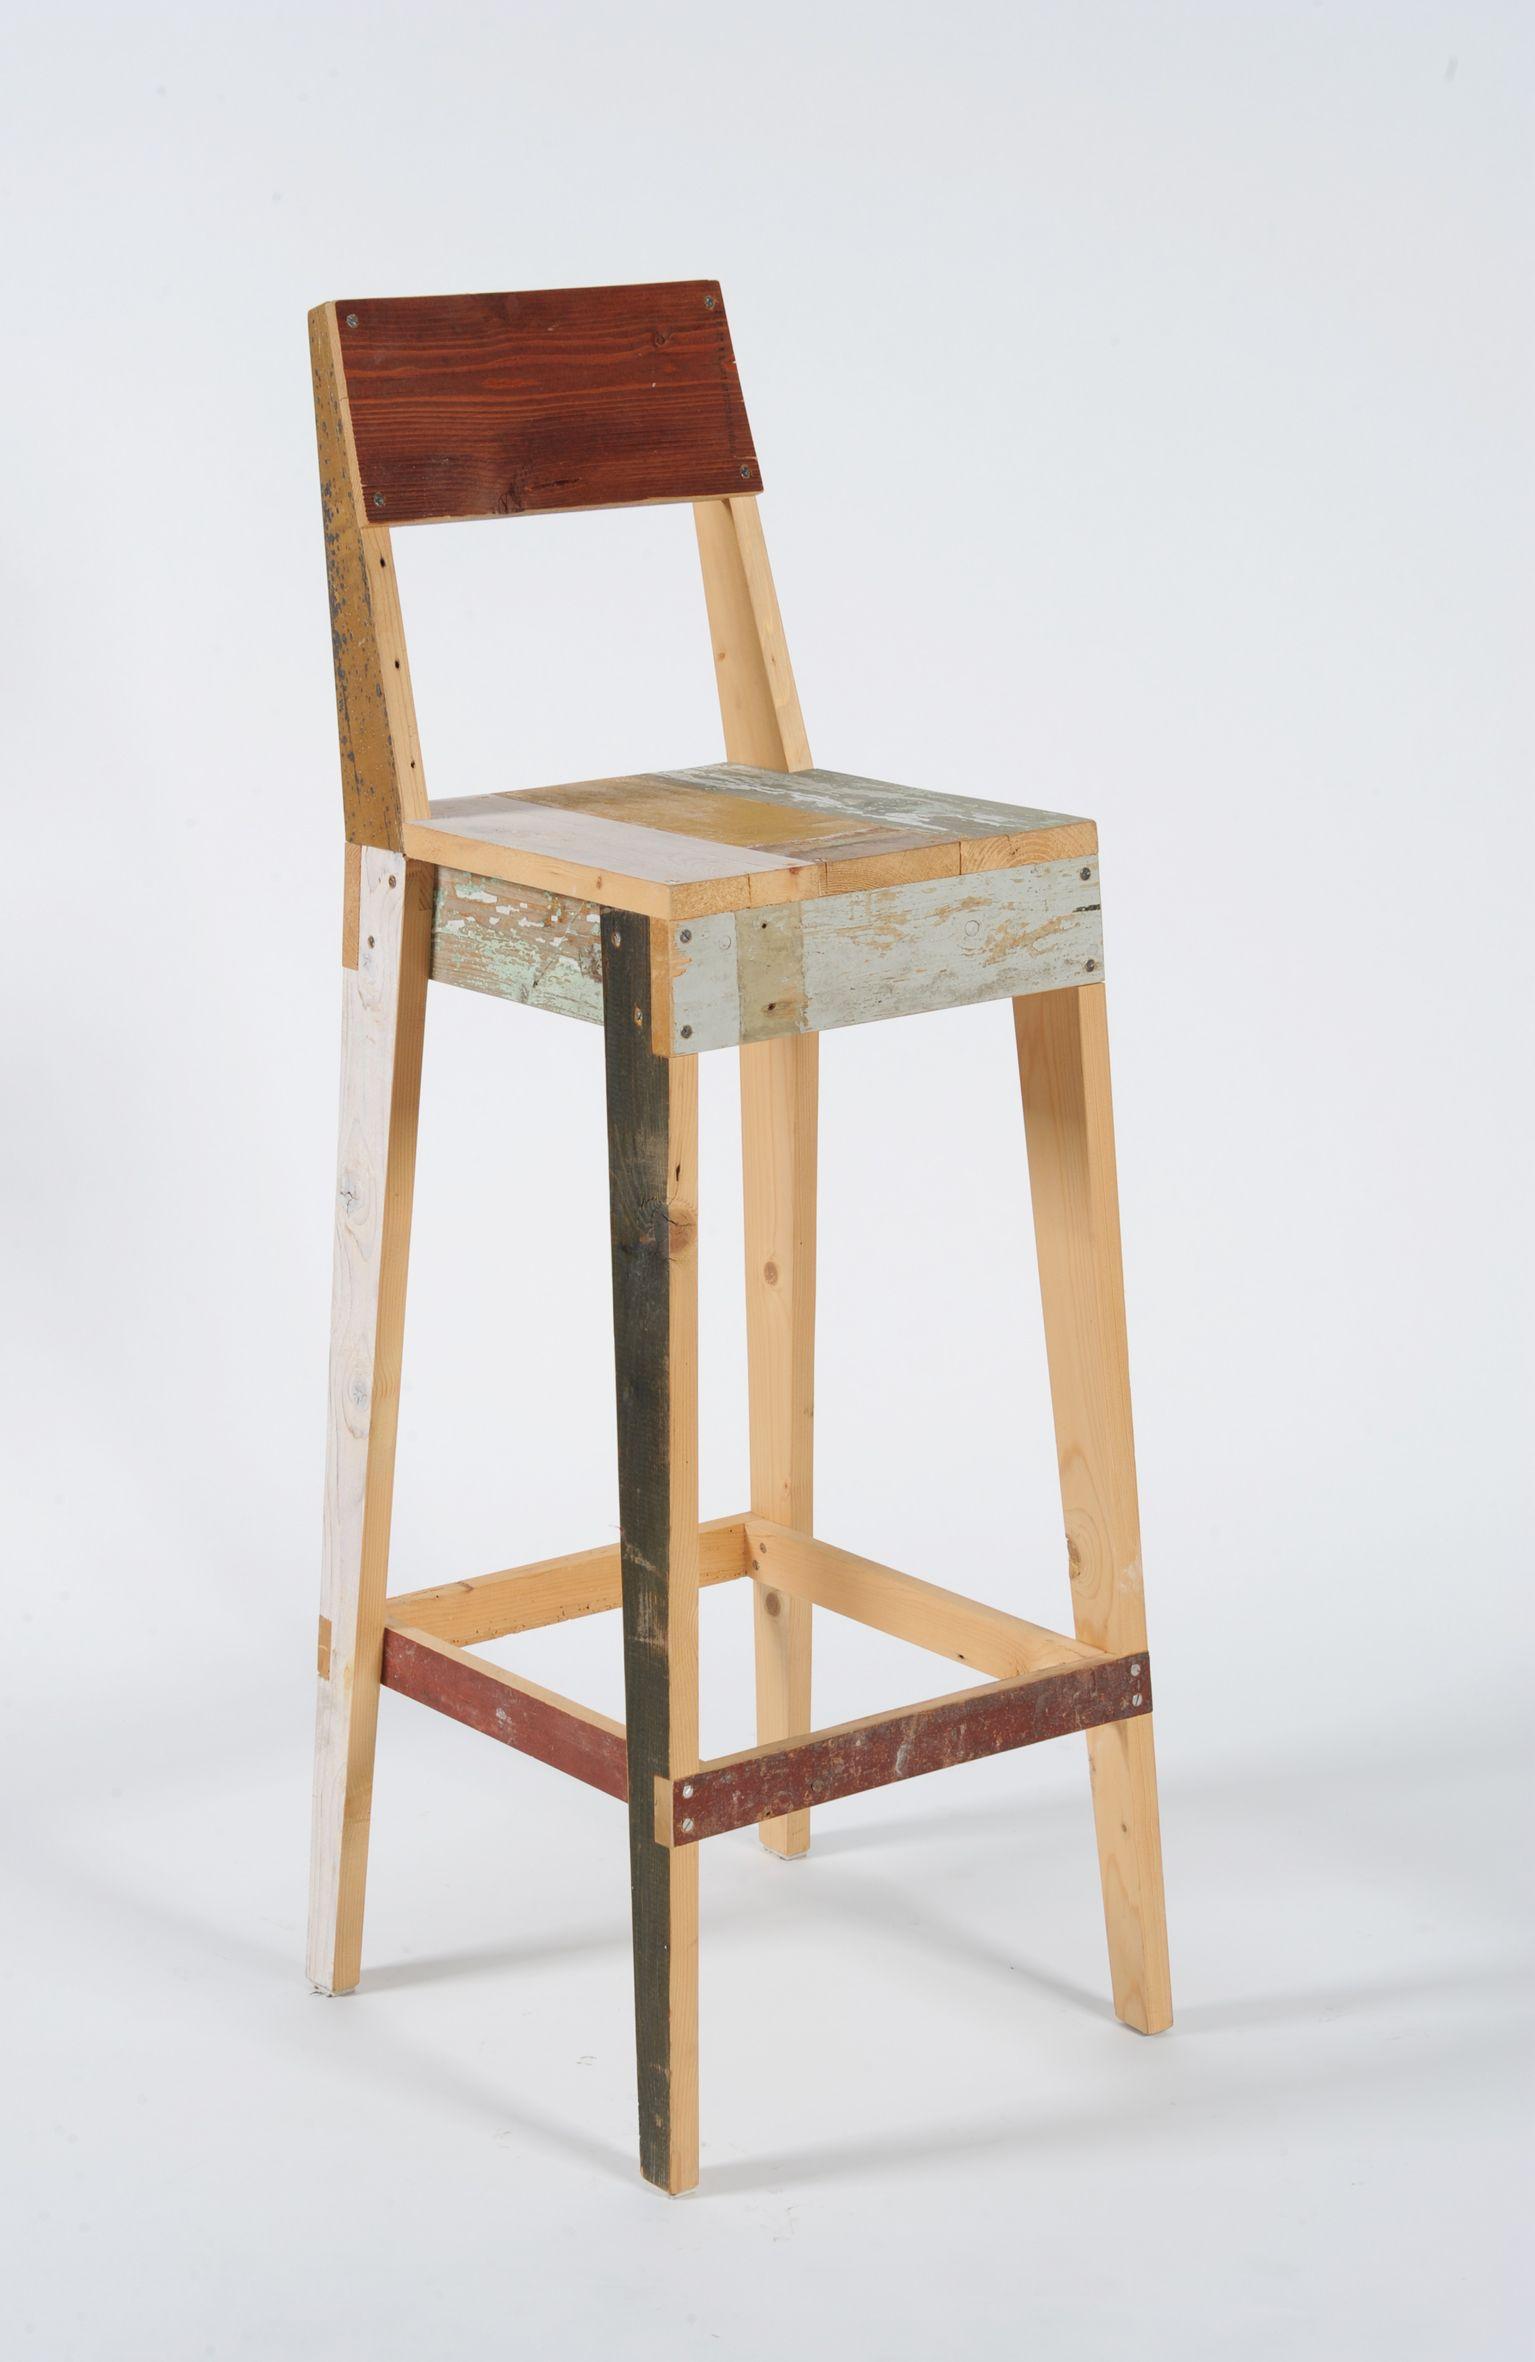 Scrap Wood Bar Stool Año Vendidas desde chairs